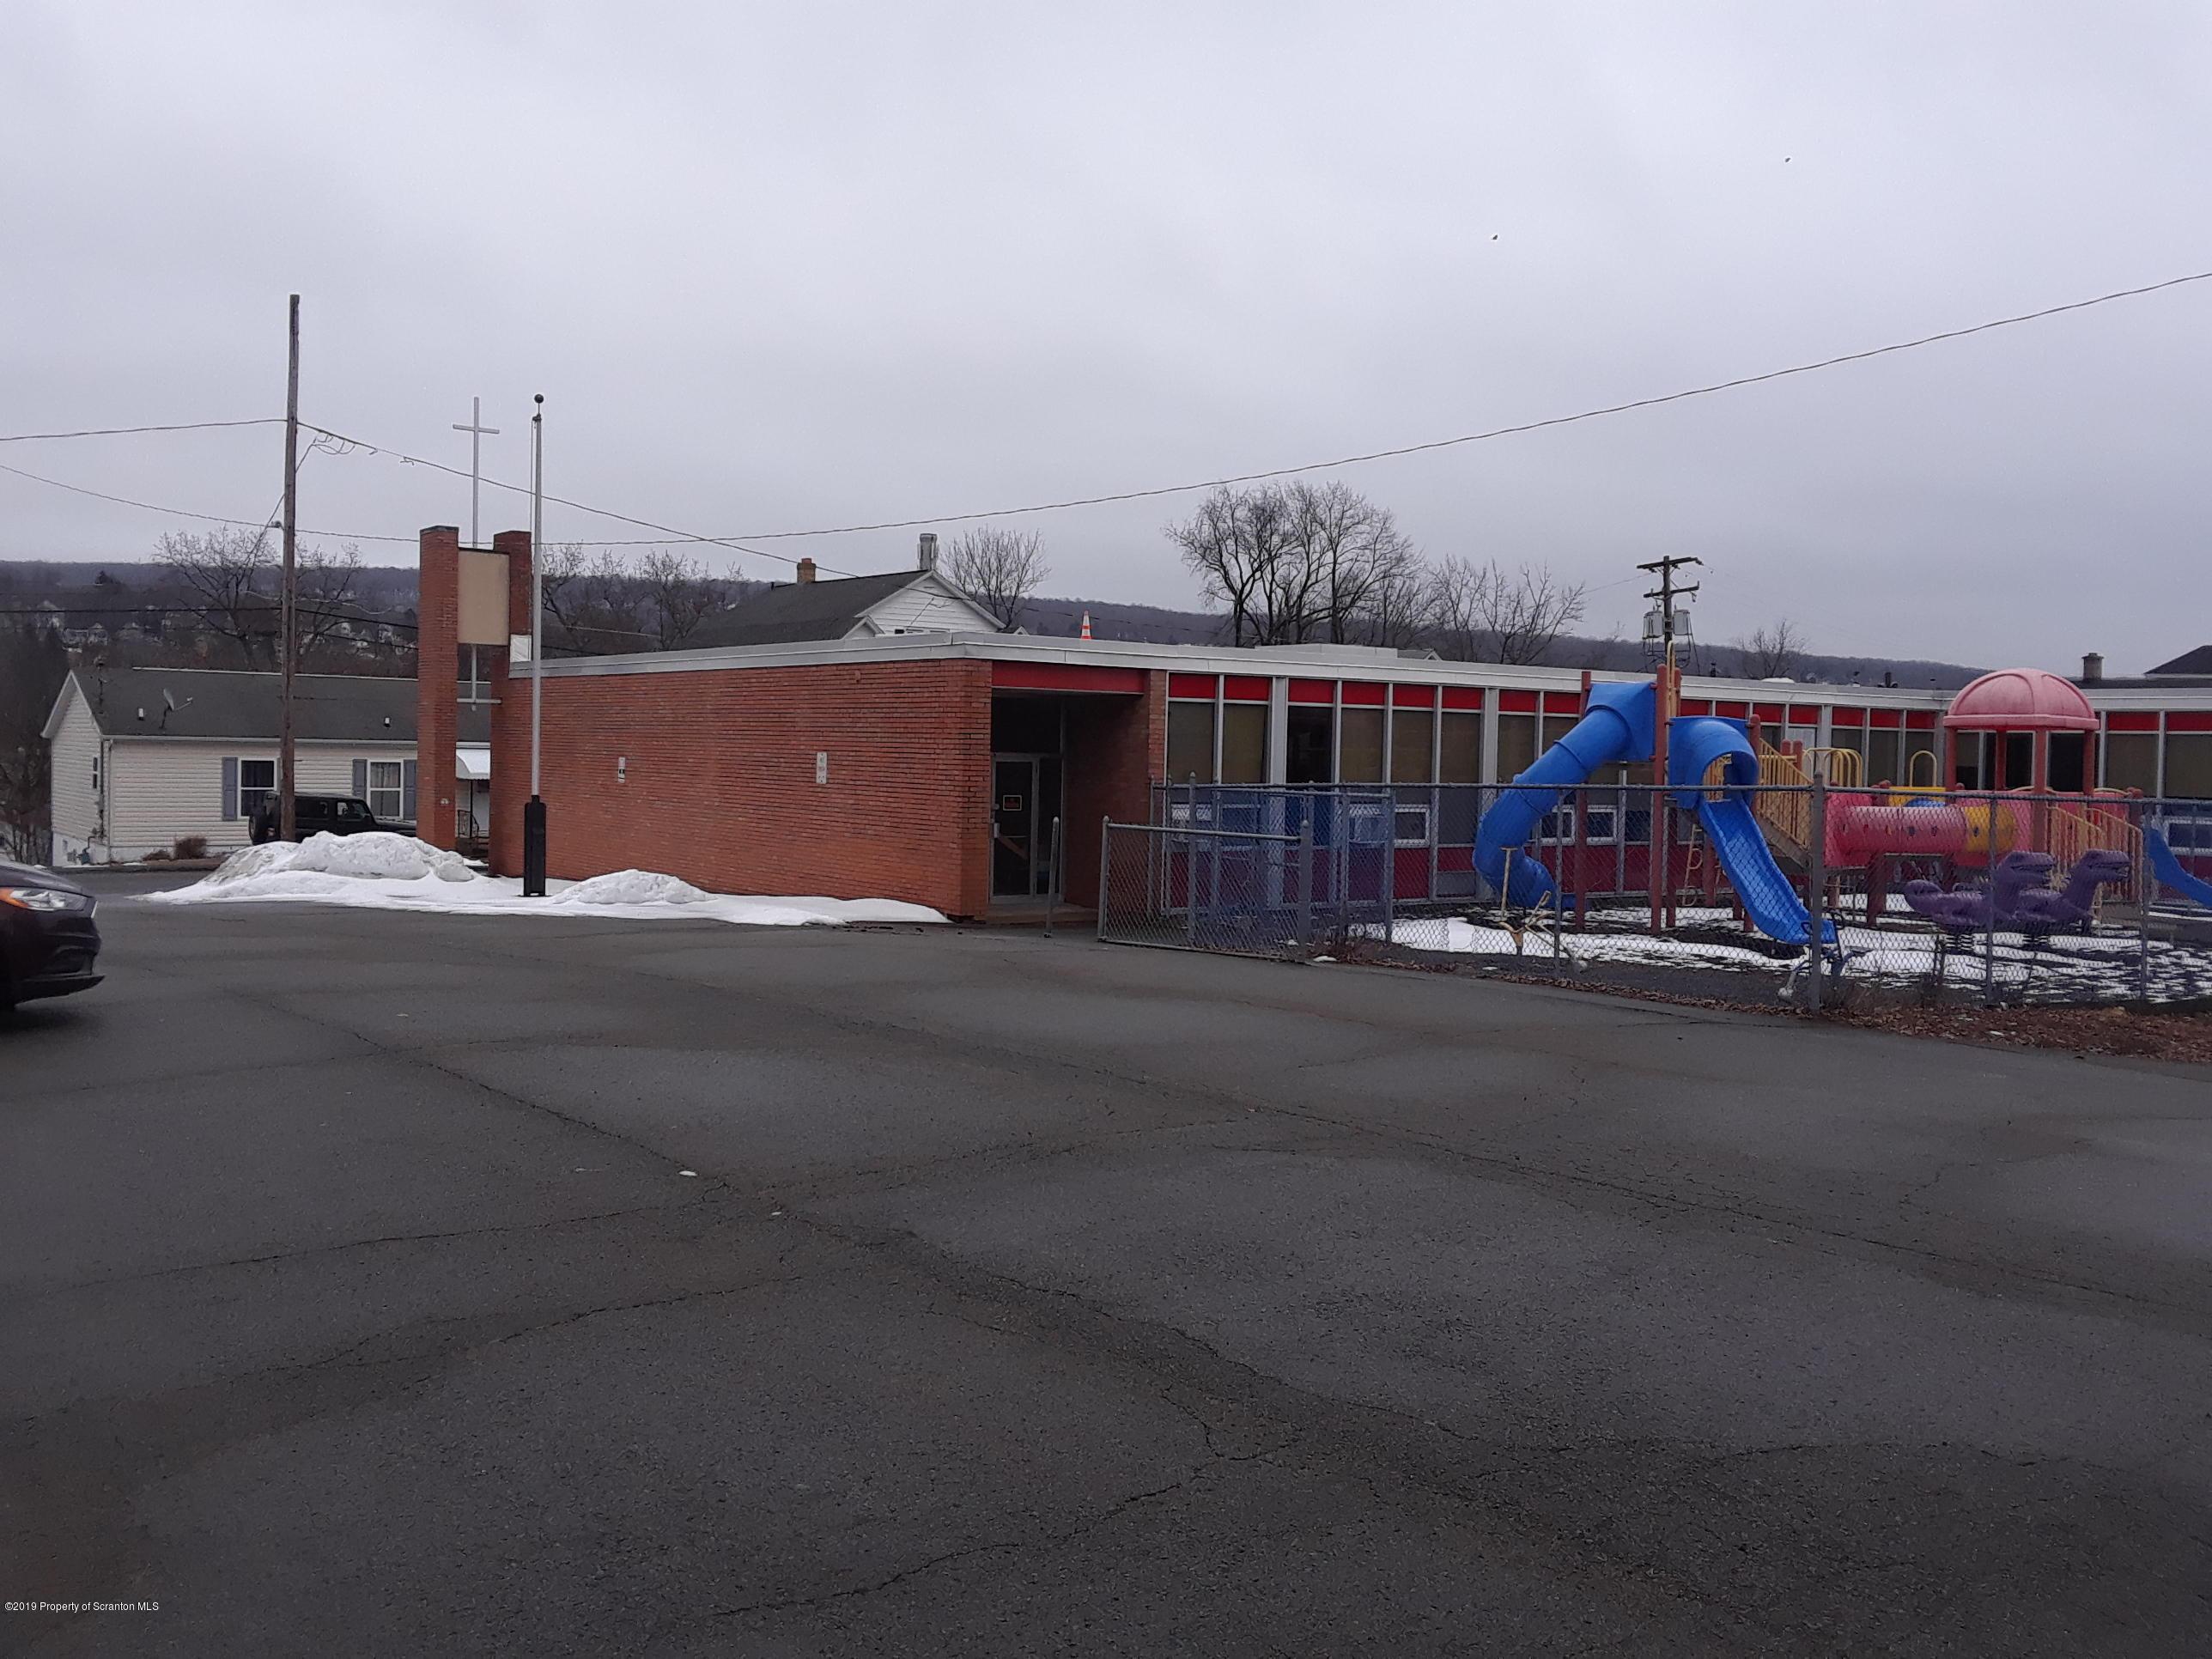 31-36 Fairview St, Carbondale, Pennsylvania 18407, ,5 BathroomsBathrooms,Commercial,For Sale,Fairview,19-765